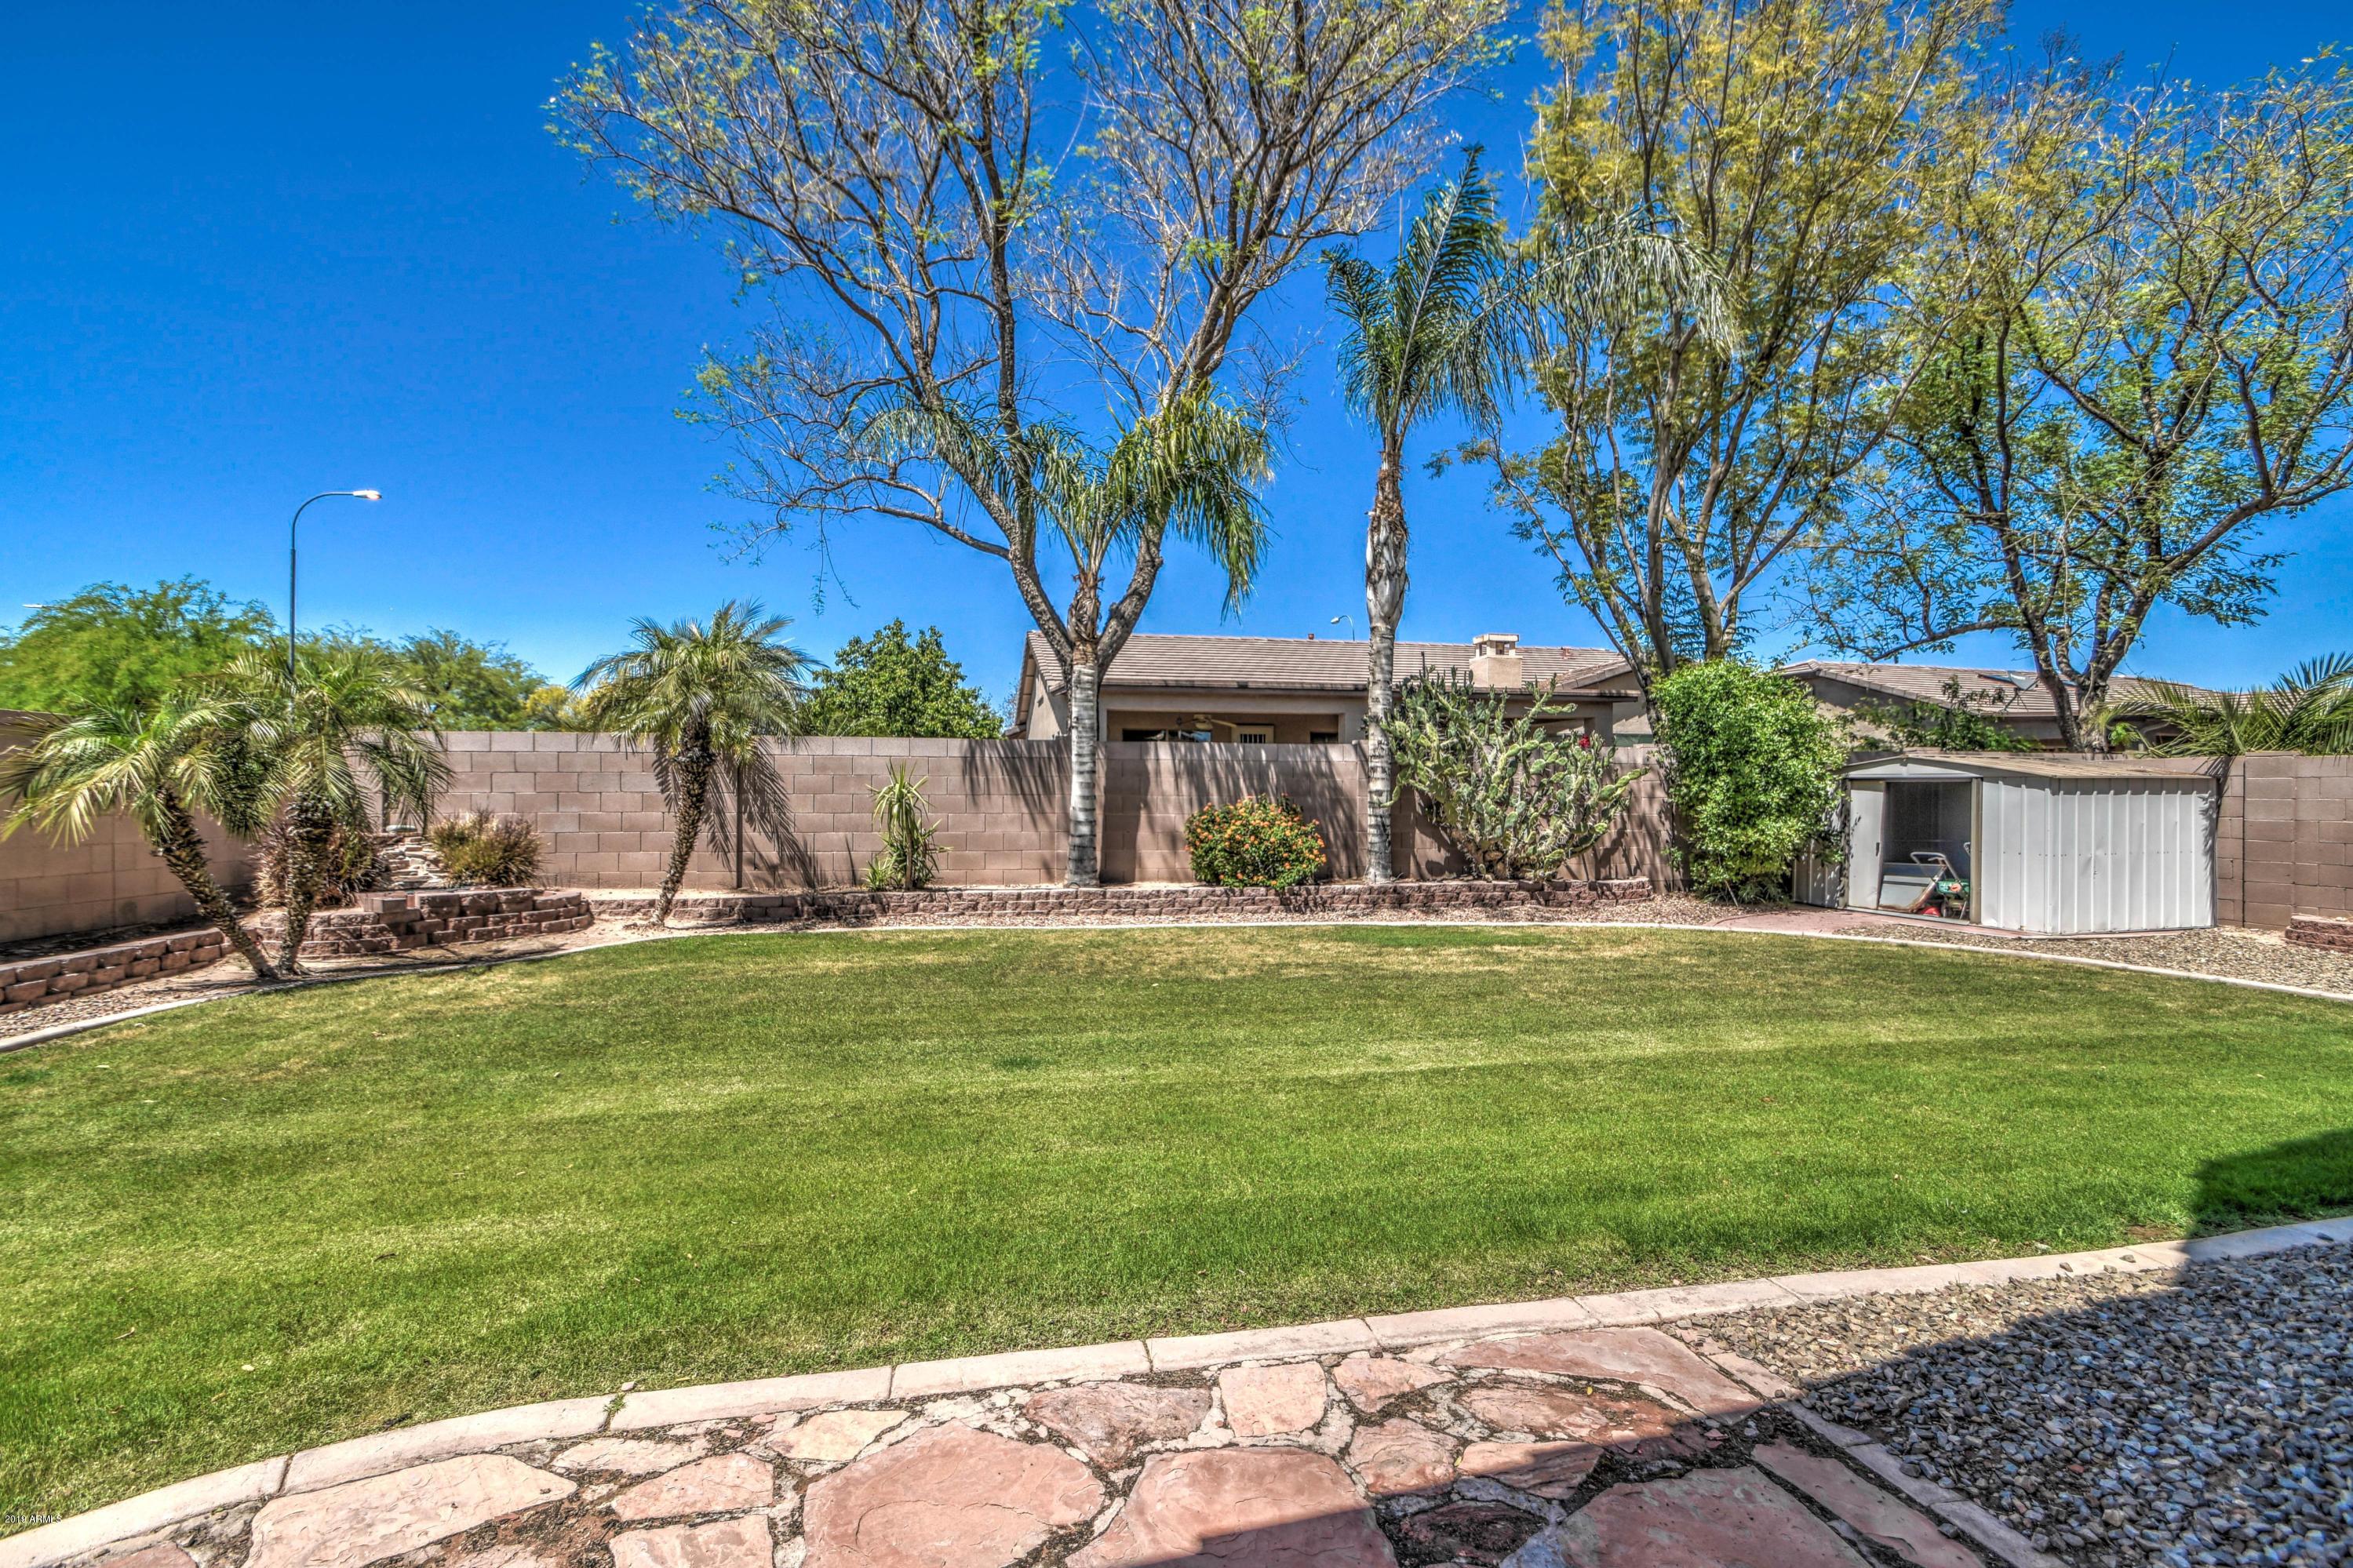 MLS 5914076 3014 E WINGED FOOT Drive, Chandler, AZ 85249 Chandler AZ Springfield Lakes